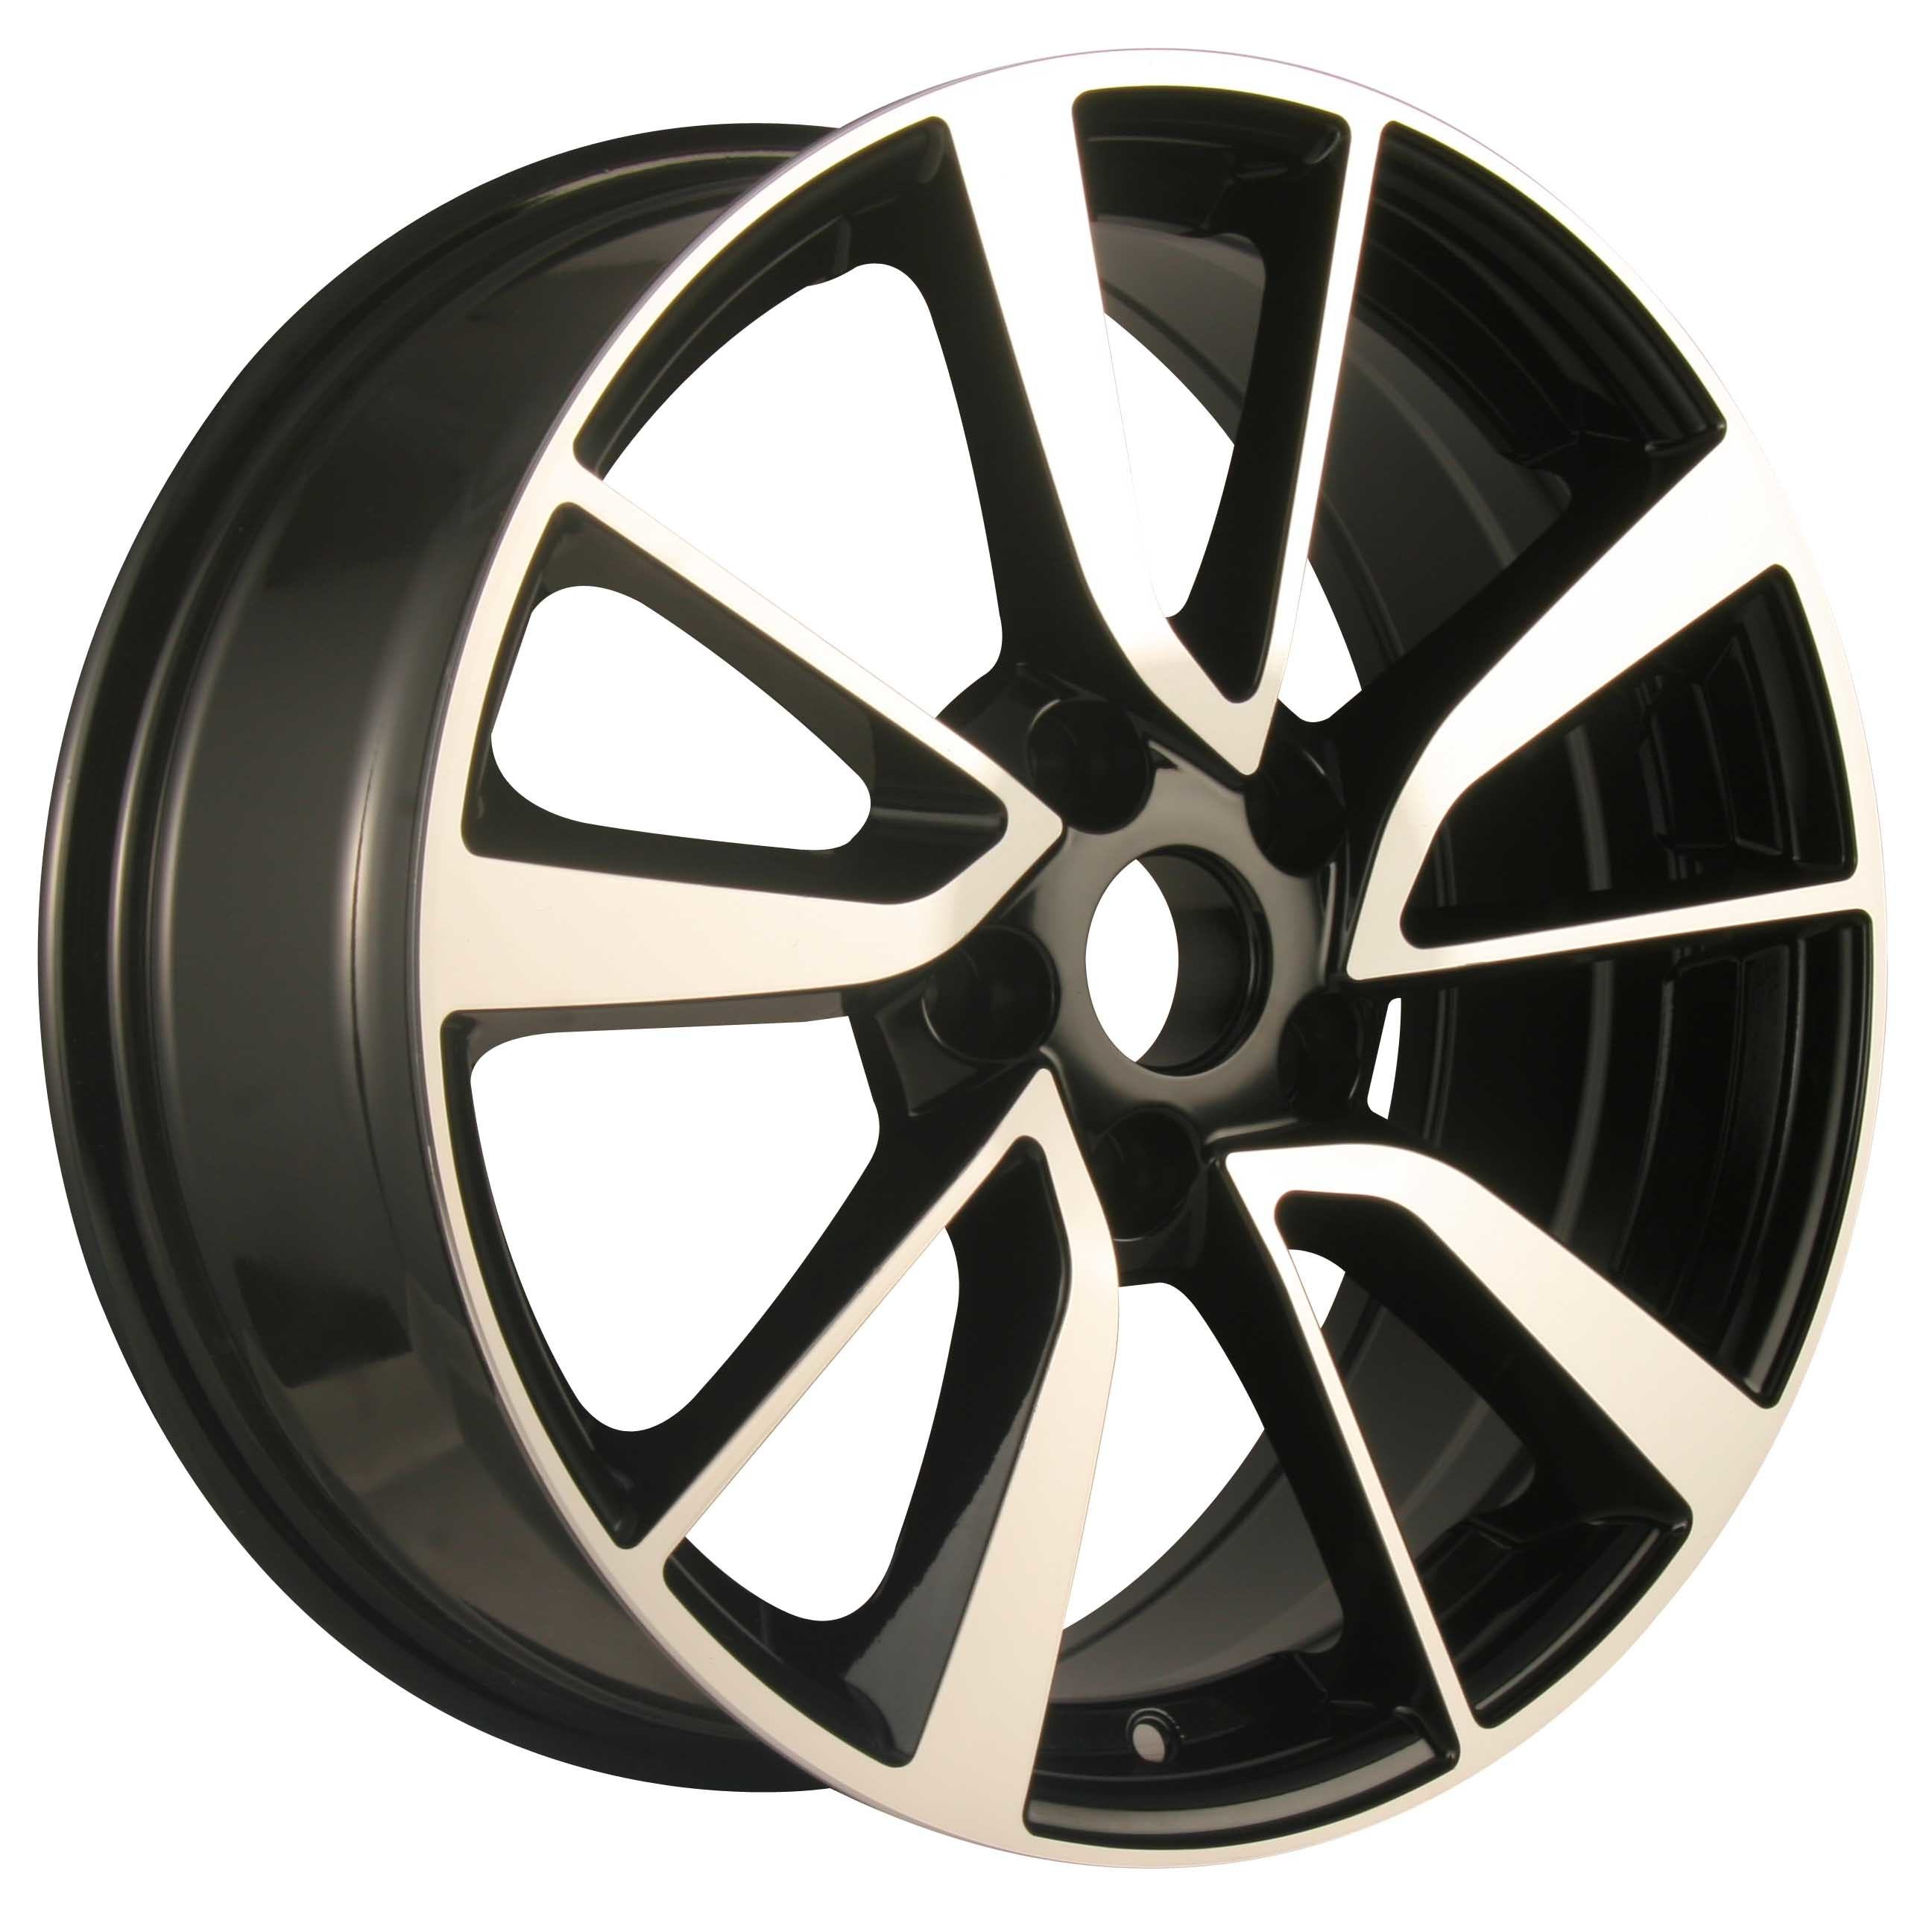 17inch Alloy Wheel Replica Wheel for Nissan 2014 X-Trail